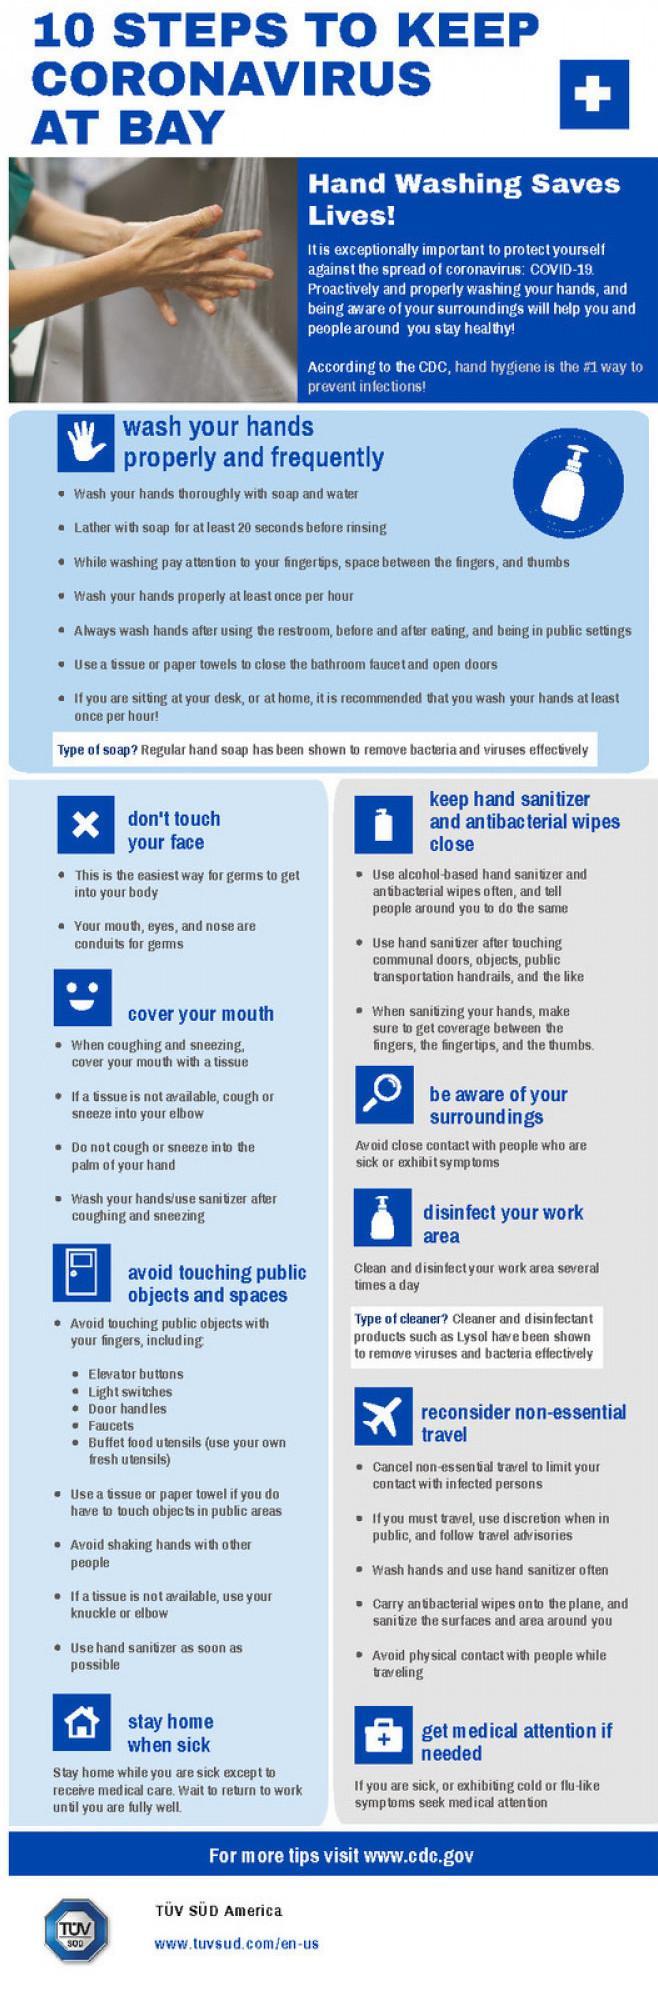 10 Ways to Keep Coronavirus at Bay